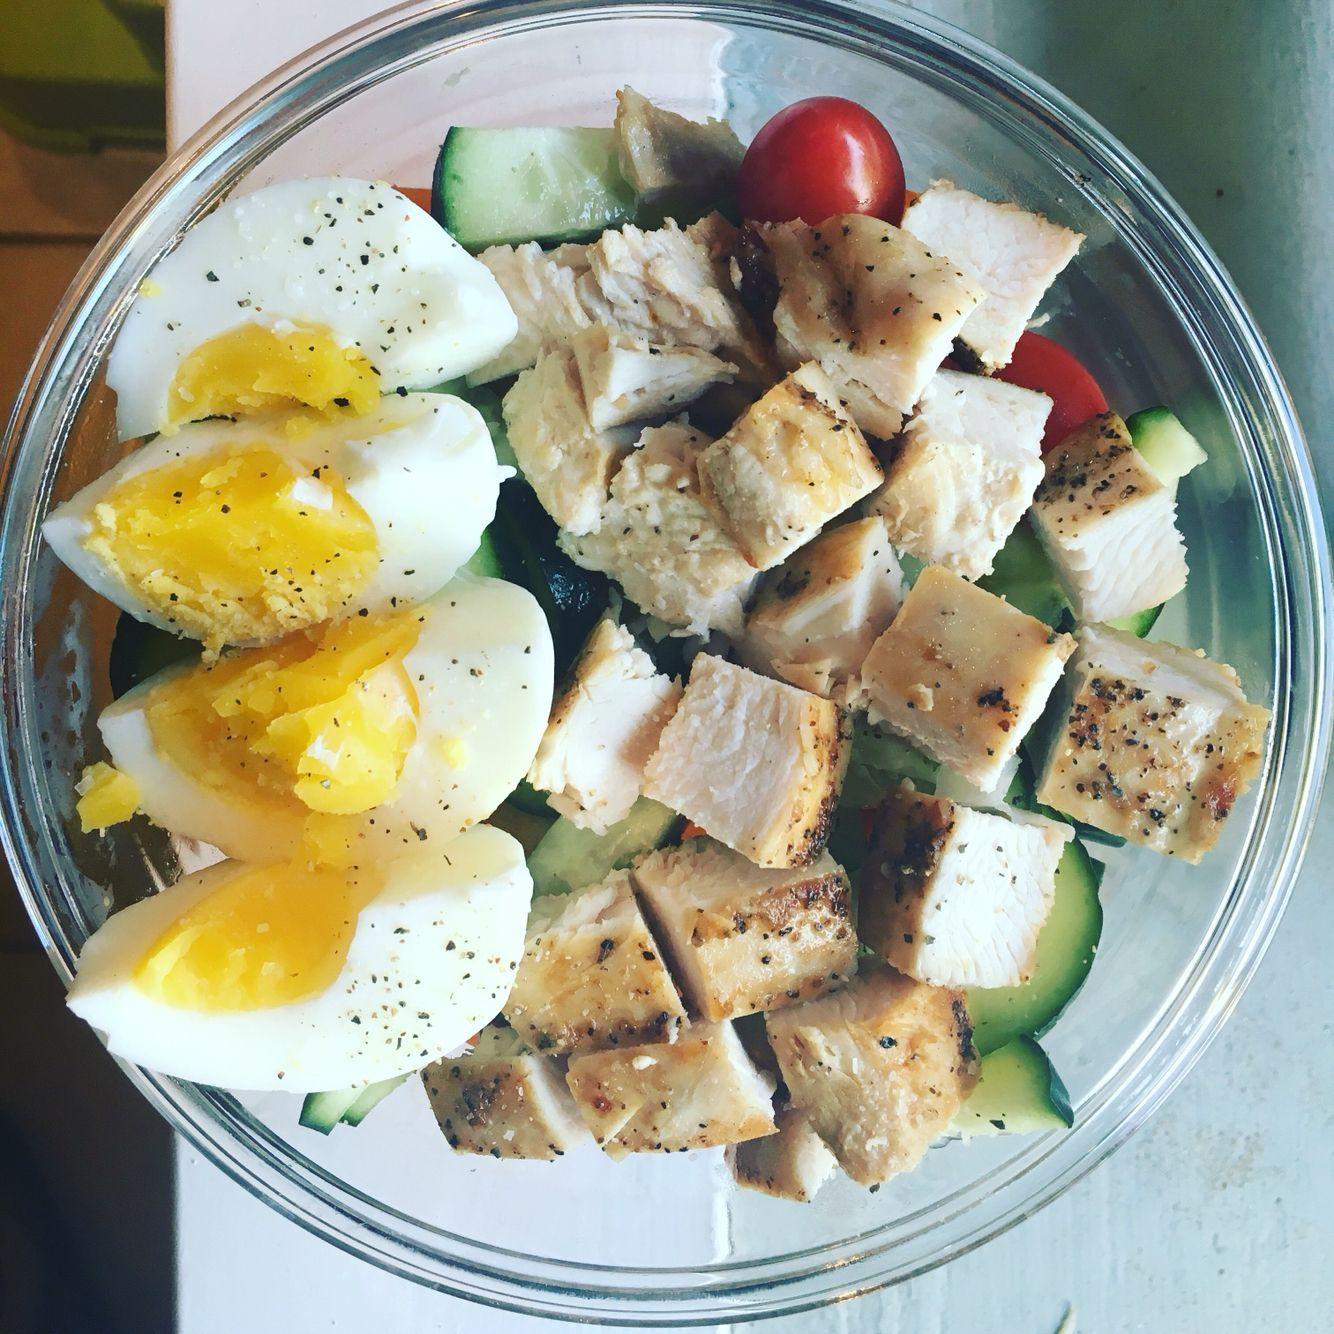 #healtyfood Cobb Salad